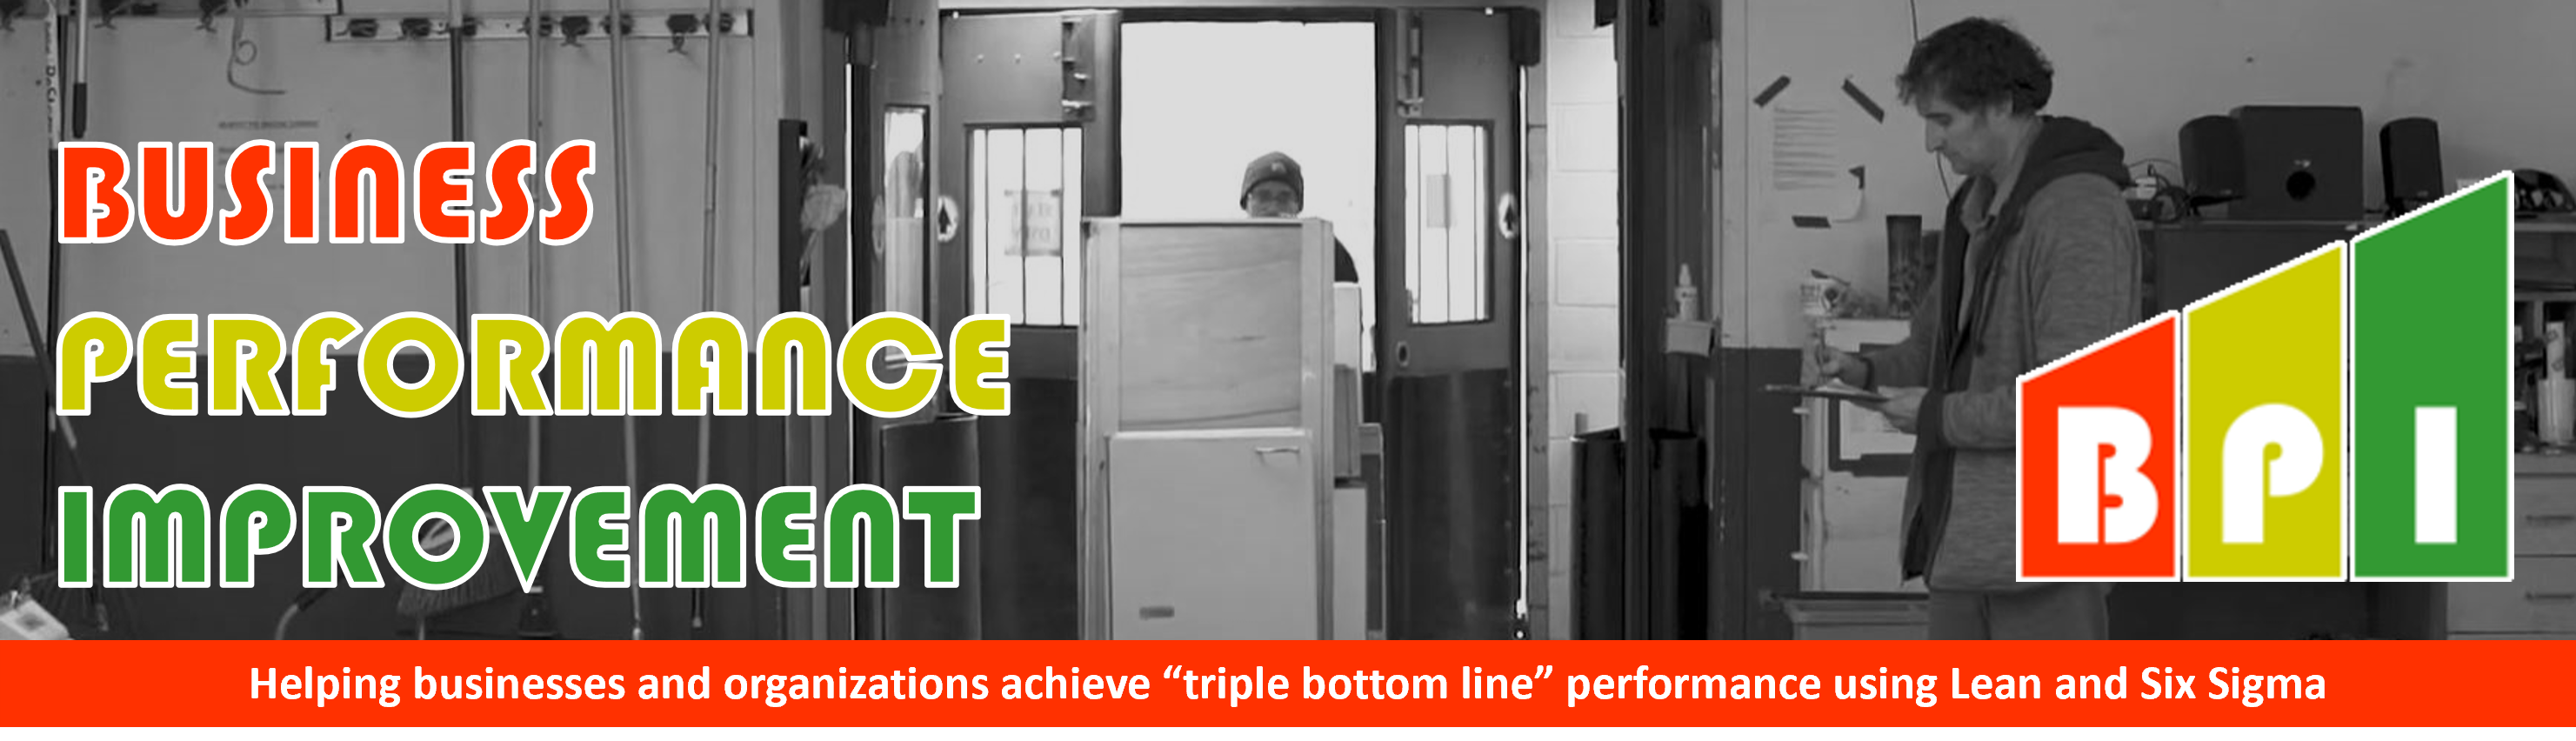 Business Performance Improvement (BPI)